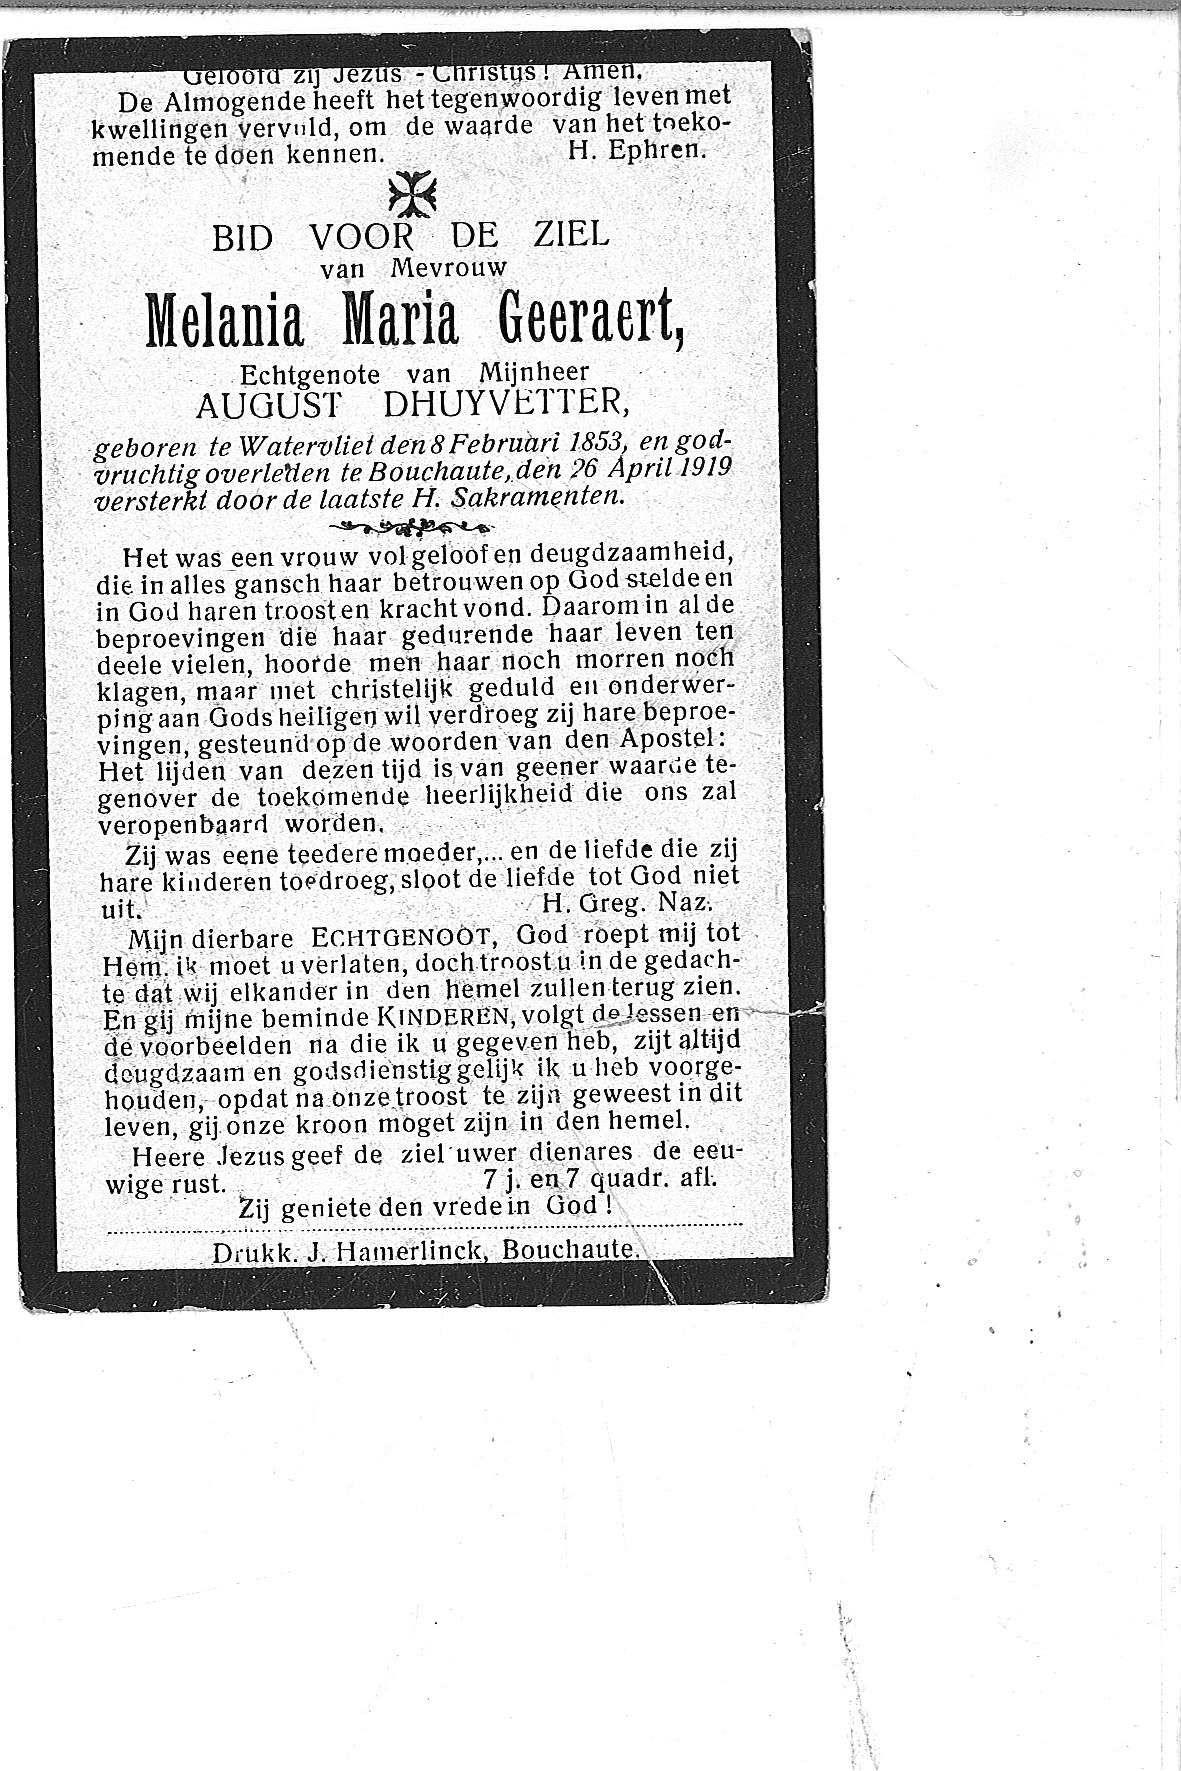 Melania-maria(1919)20130604133153_00055.jpg